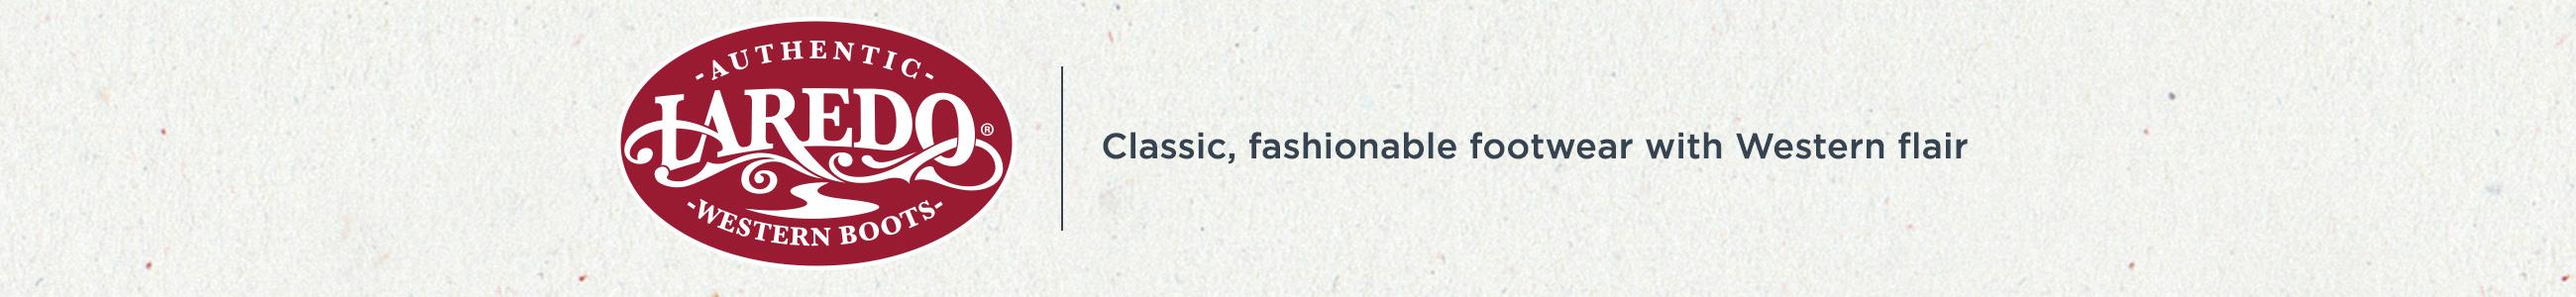 Laredo — Classic, fashionable footwear with western flair